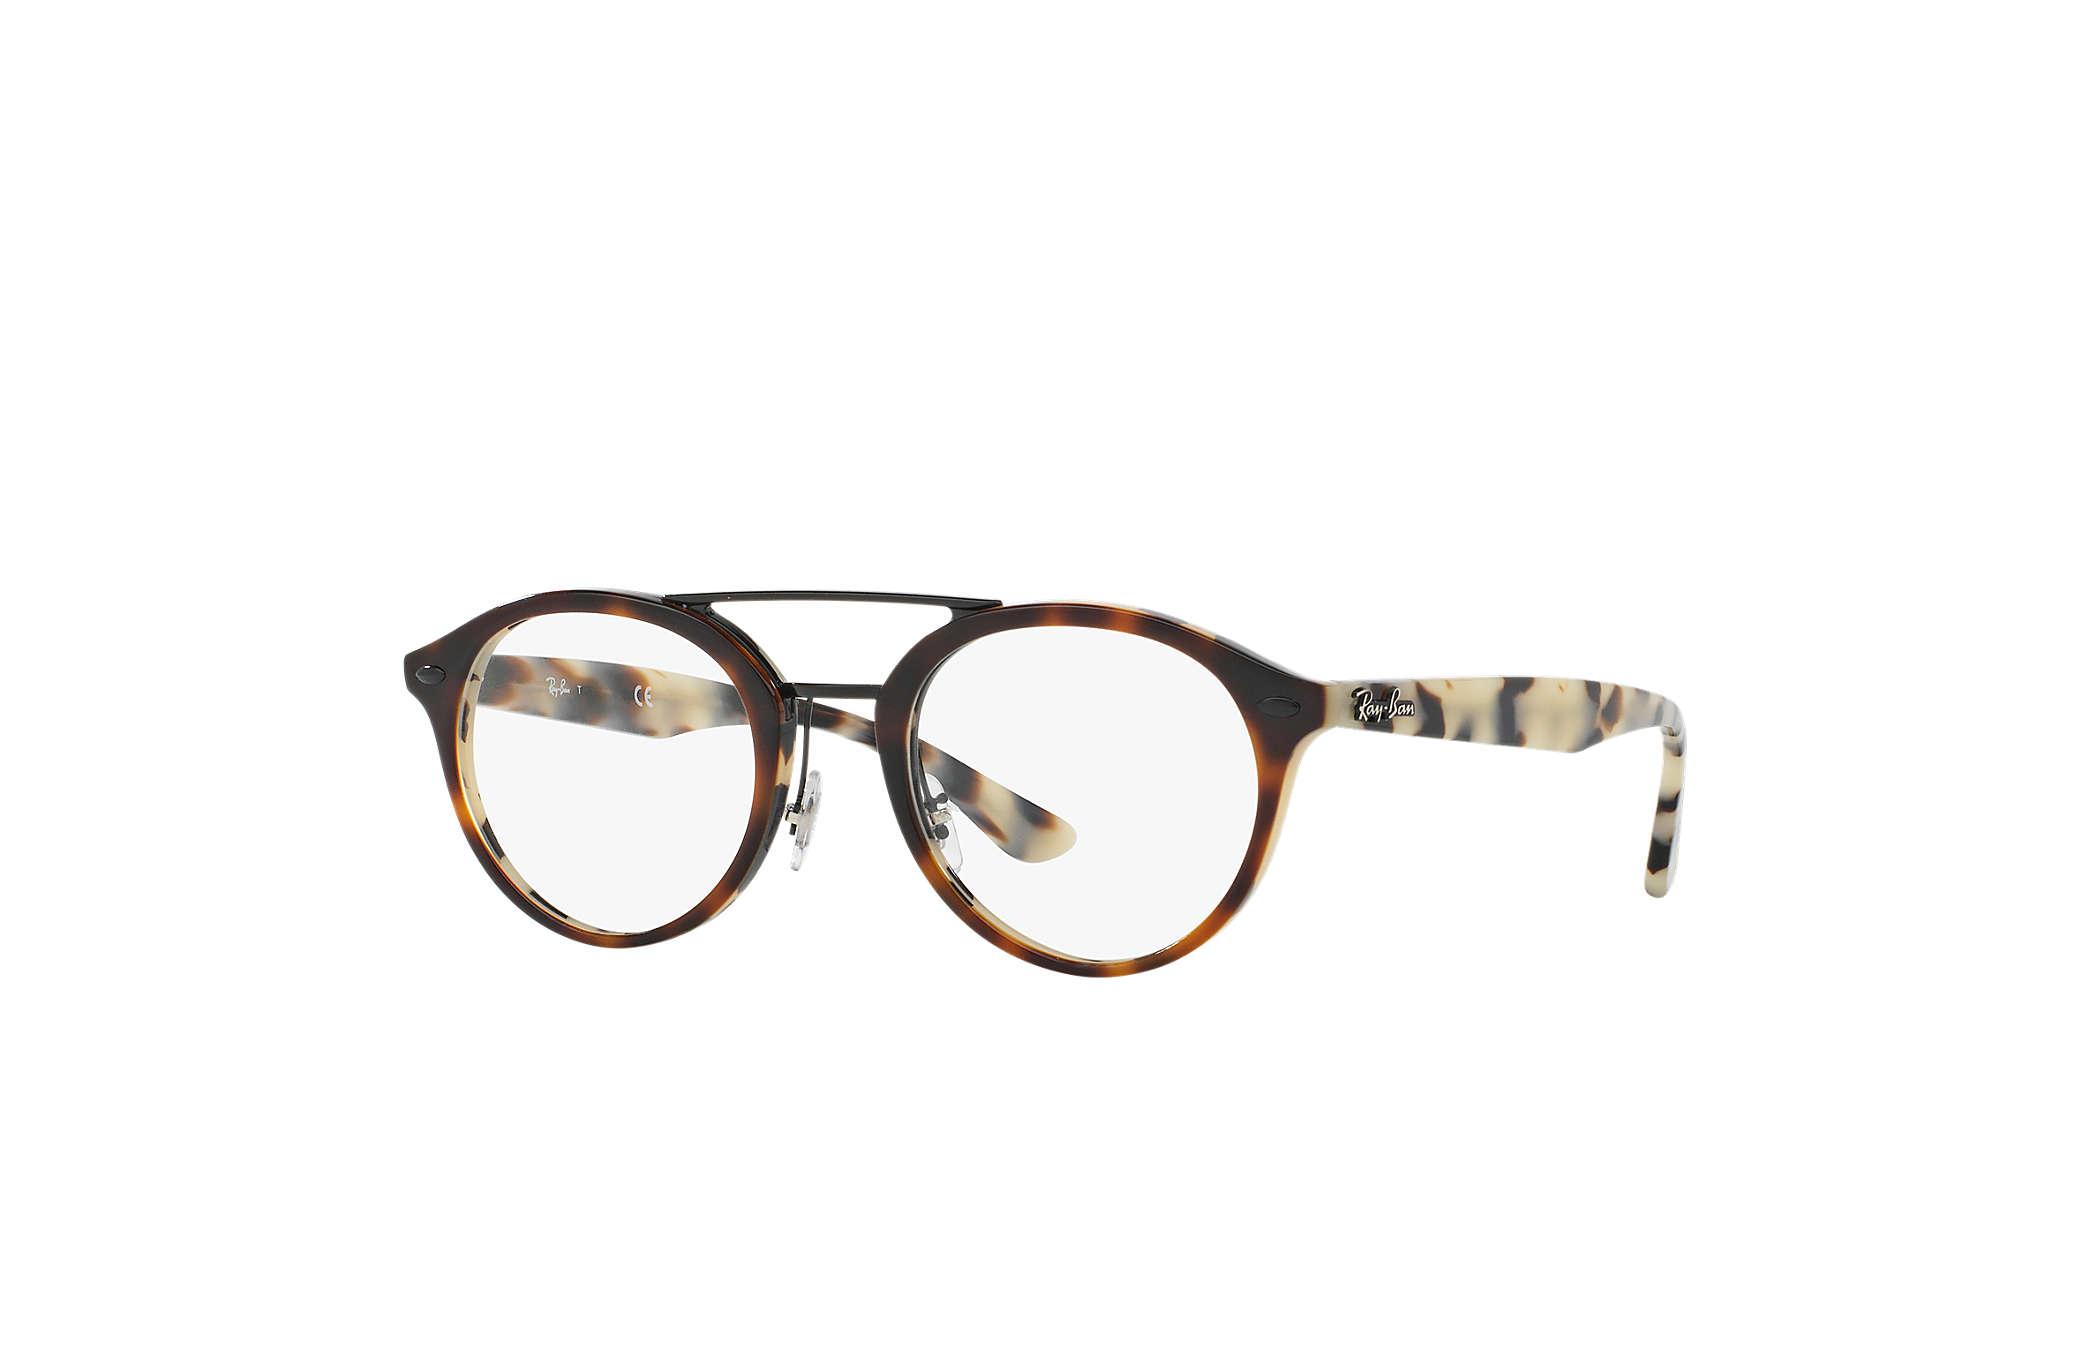 ray ban brille logo entfernen